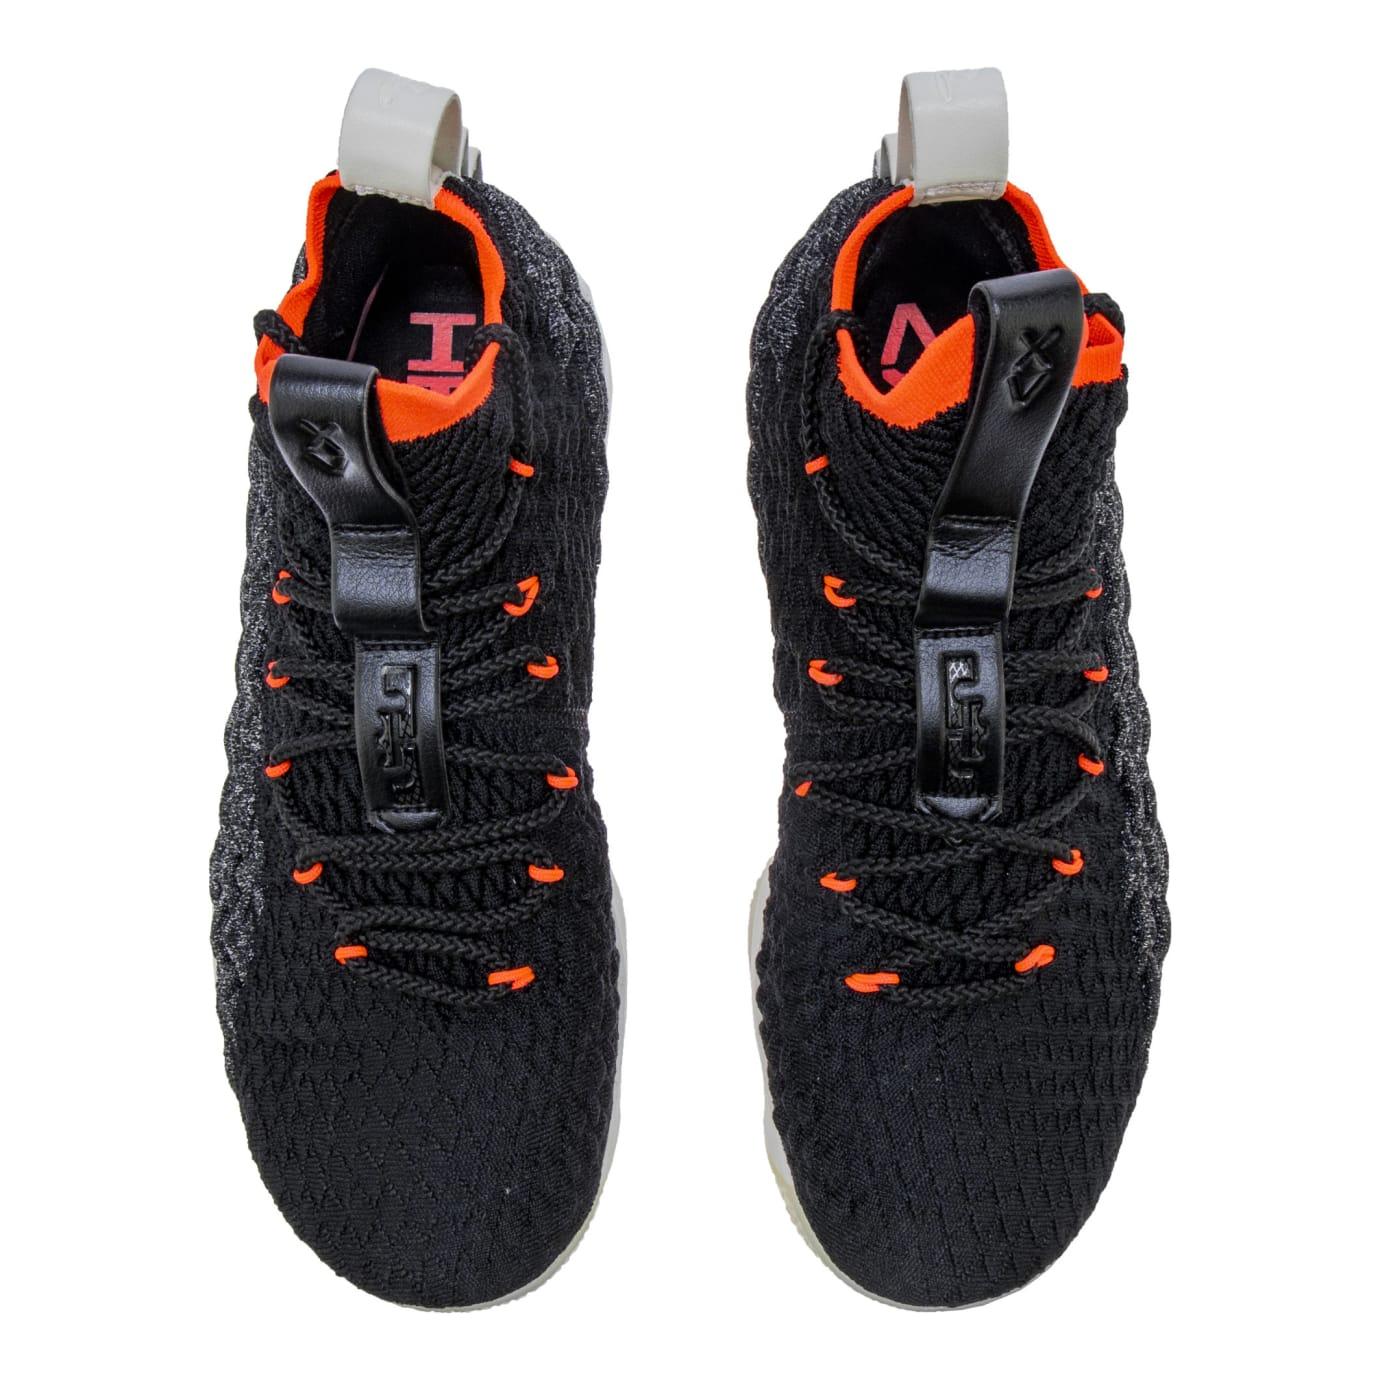 3d0bf9a254e0a Image via US11 · Nike LeBron 15  Bright Crimson  AQ2363-002 (Top)